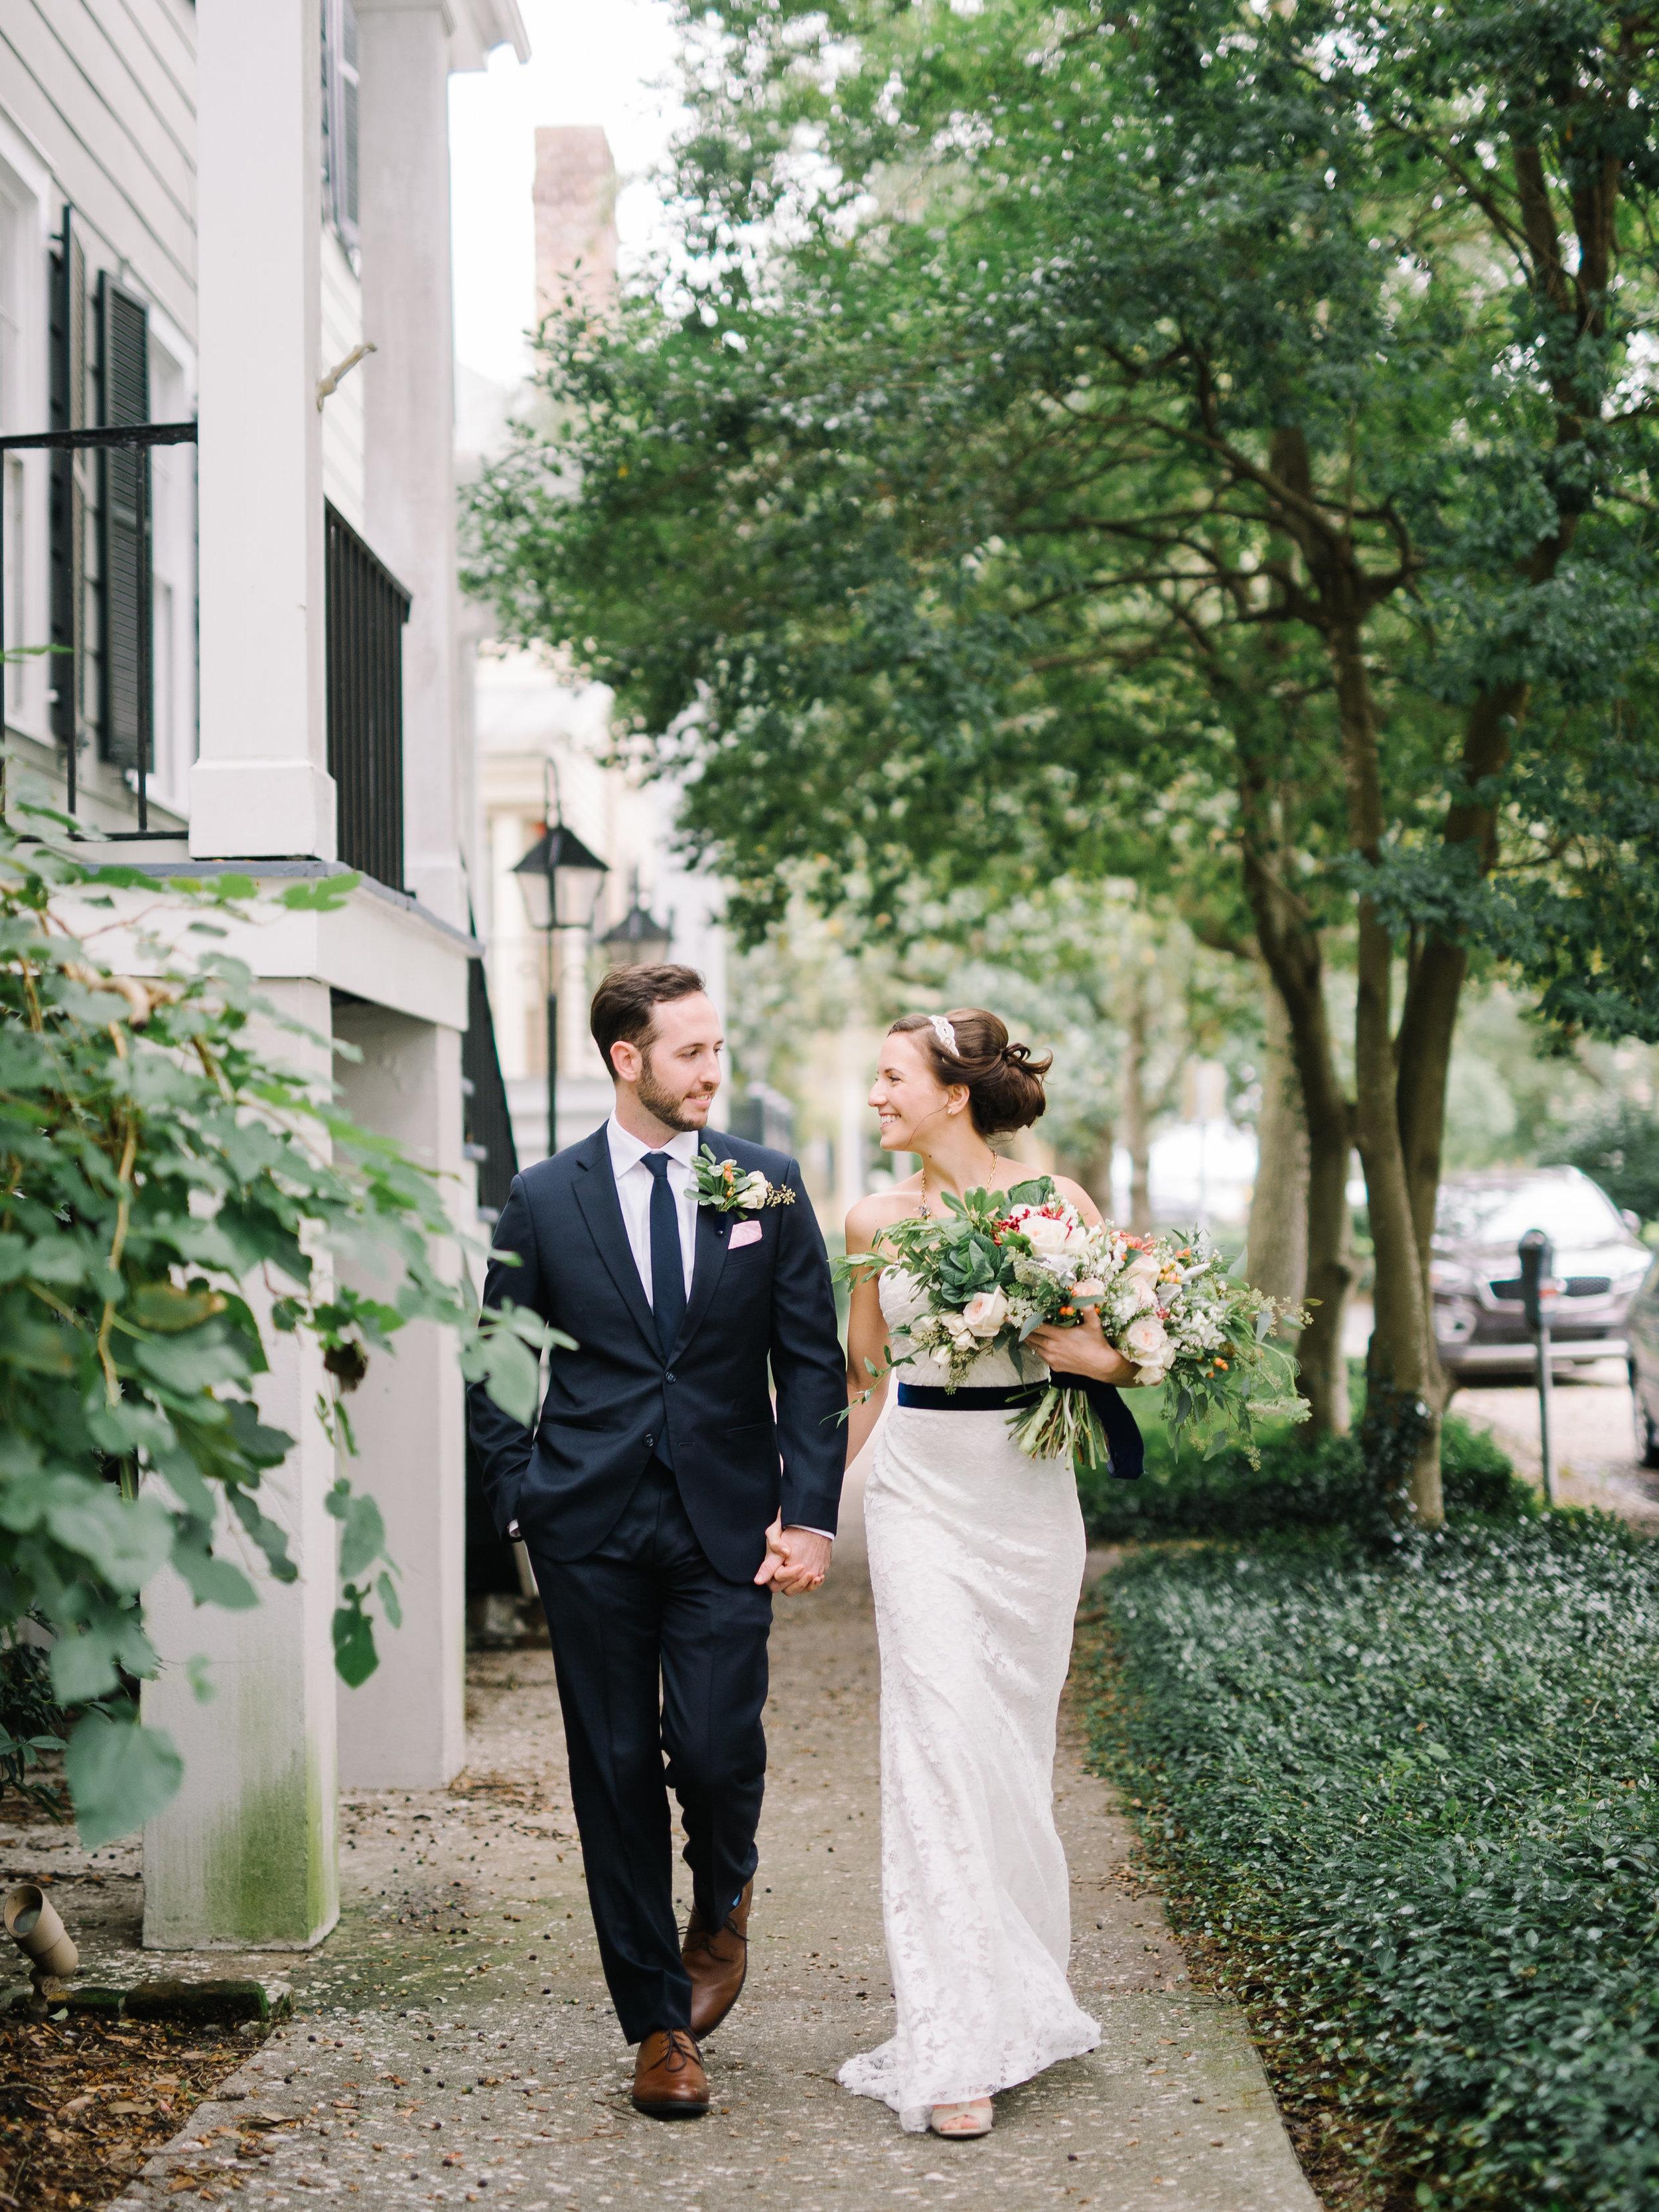 amber-and-paul-rach-loves-troy-charles-h-morris-center-wedding-sarah-seven-helene-lace-wedding-dress-ivory-and-beau-bridal-boutique-savannah-wedding-planner-savannah-event-designer-savannah-florist-savannah-weddings-savannah-bridal-boutique-11.jpg